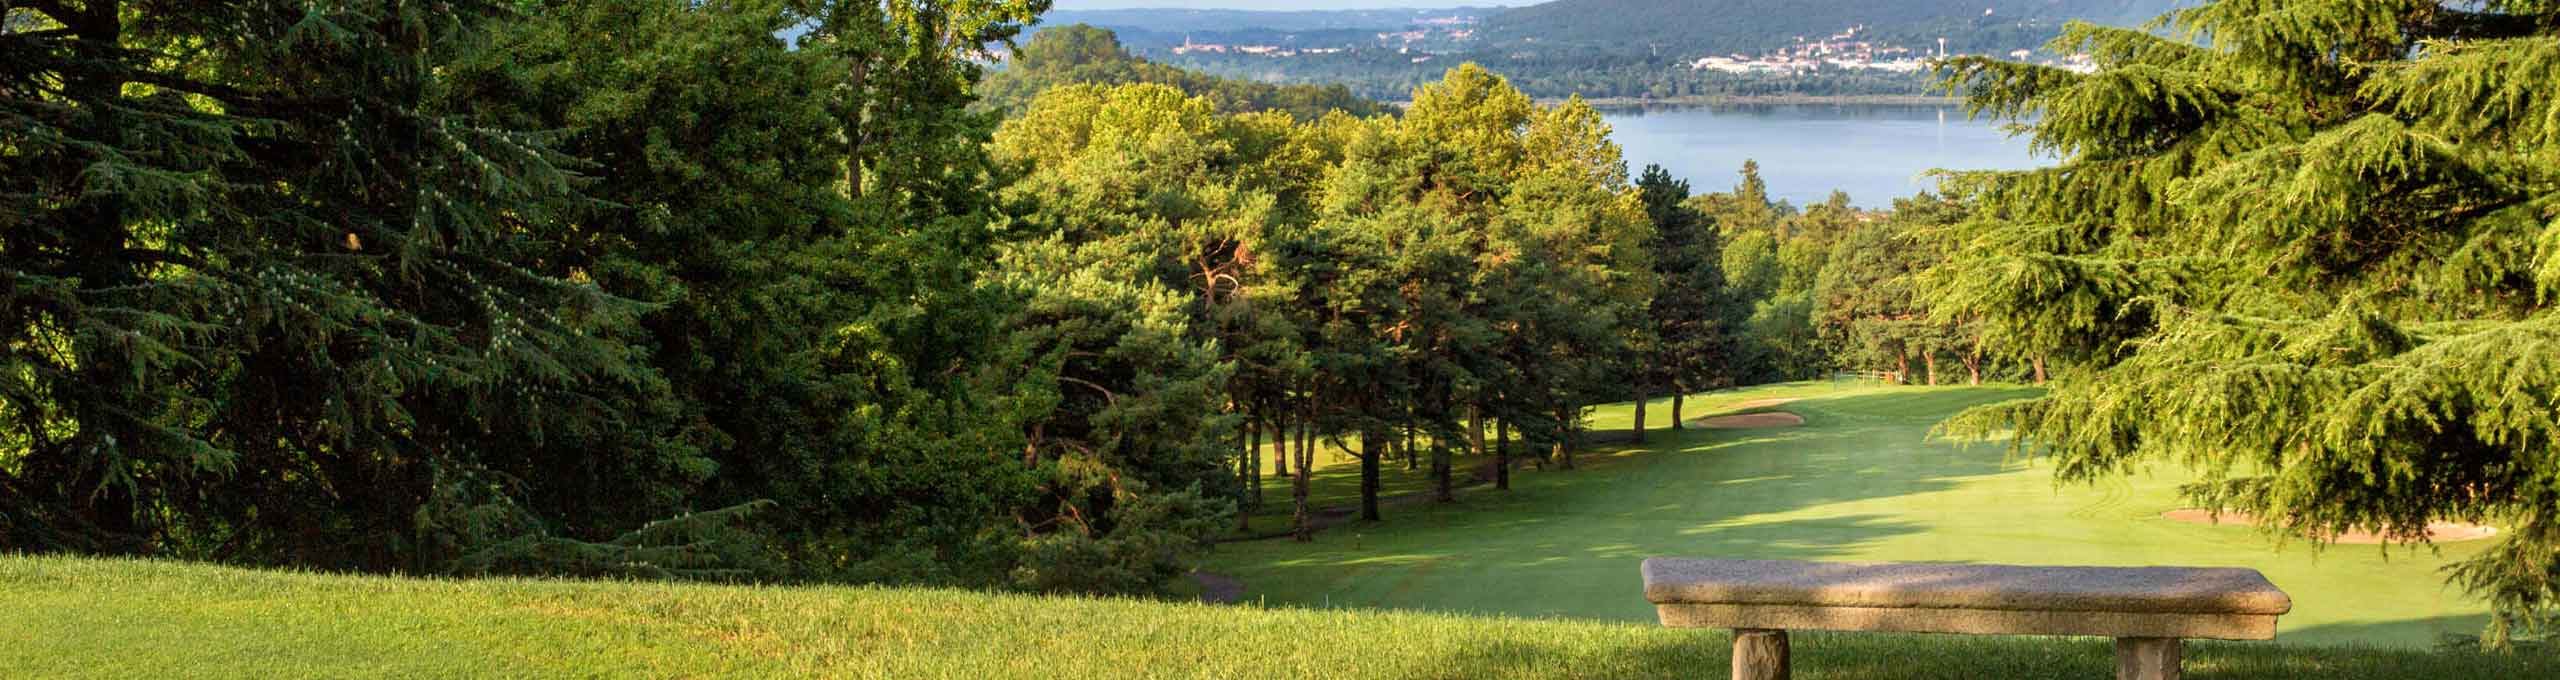 Luvinate, Varese - Il Golf CLub